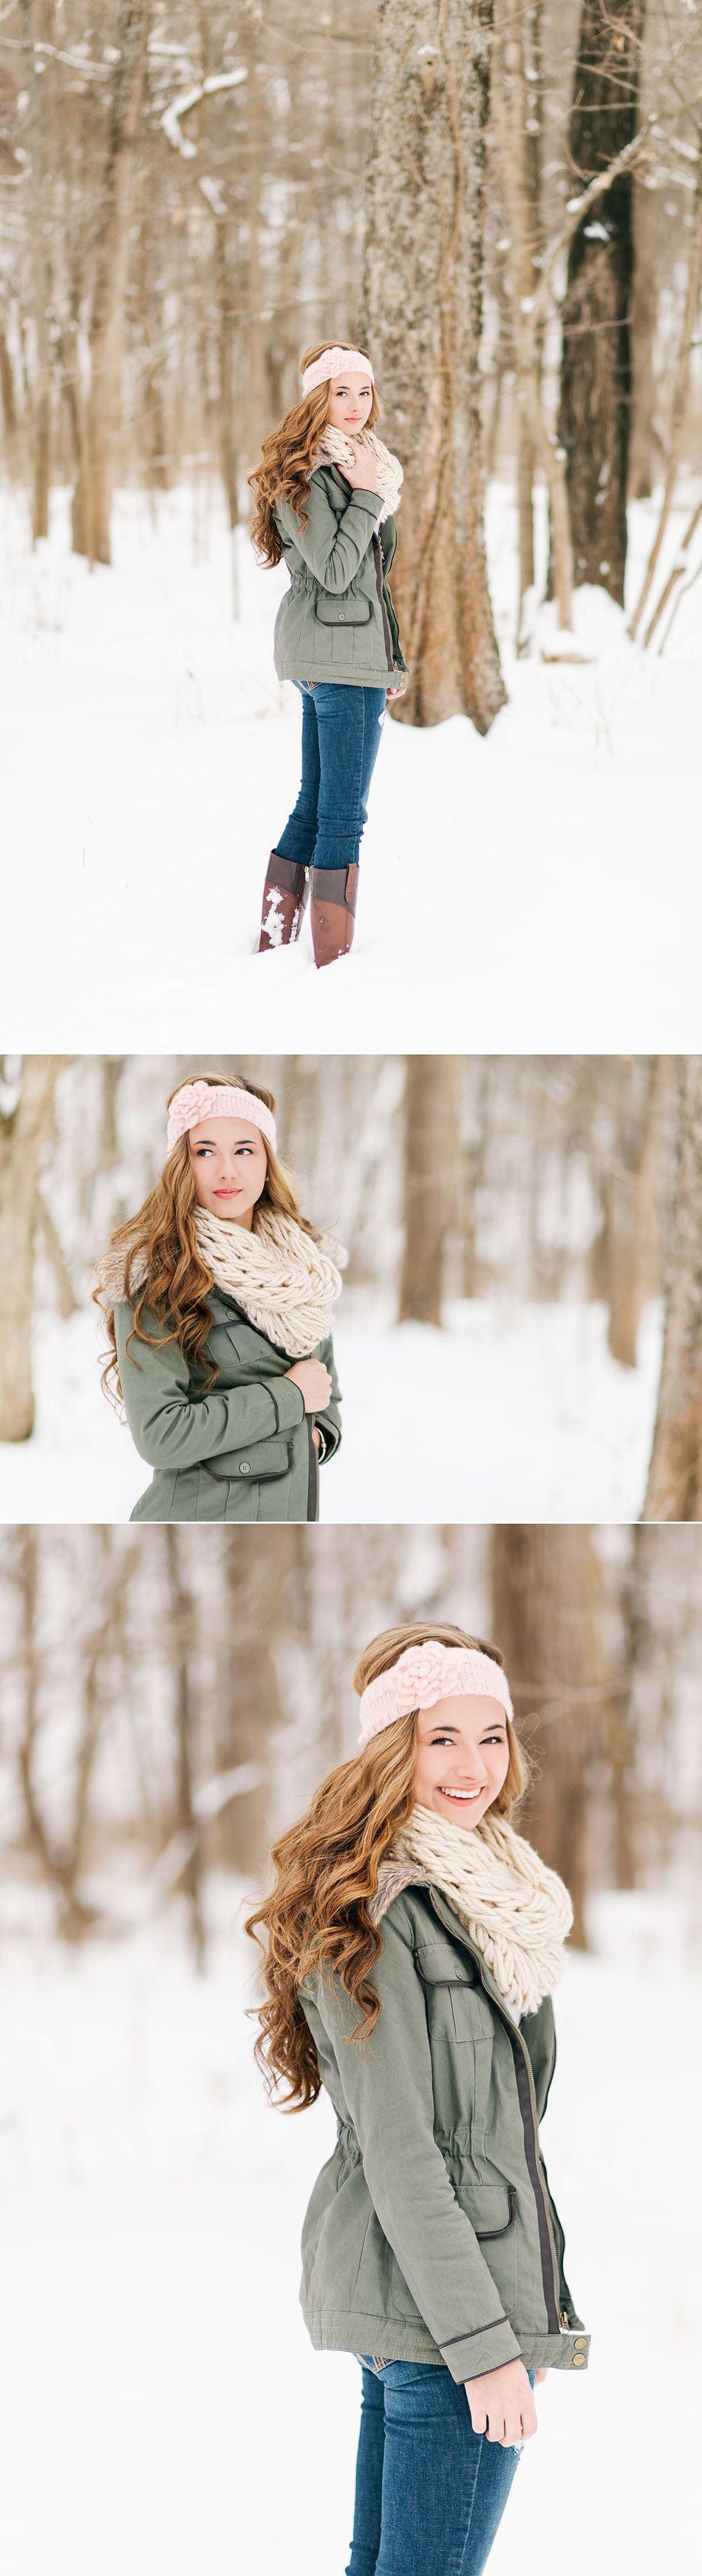 Lux Senior Photography - Snowy Senior Portraits in Bellbrook, Ohio